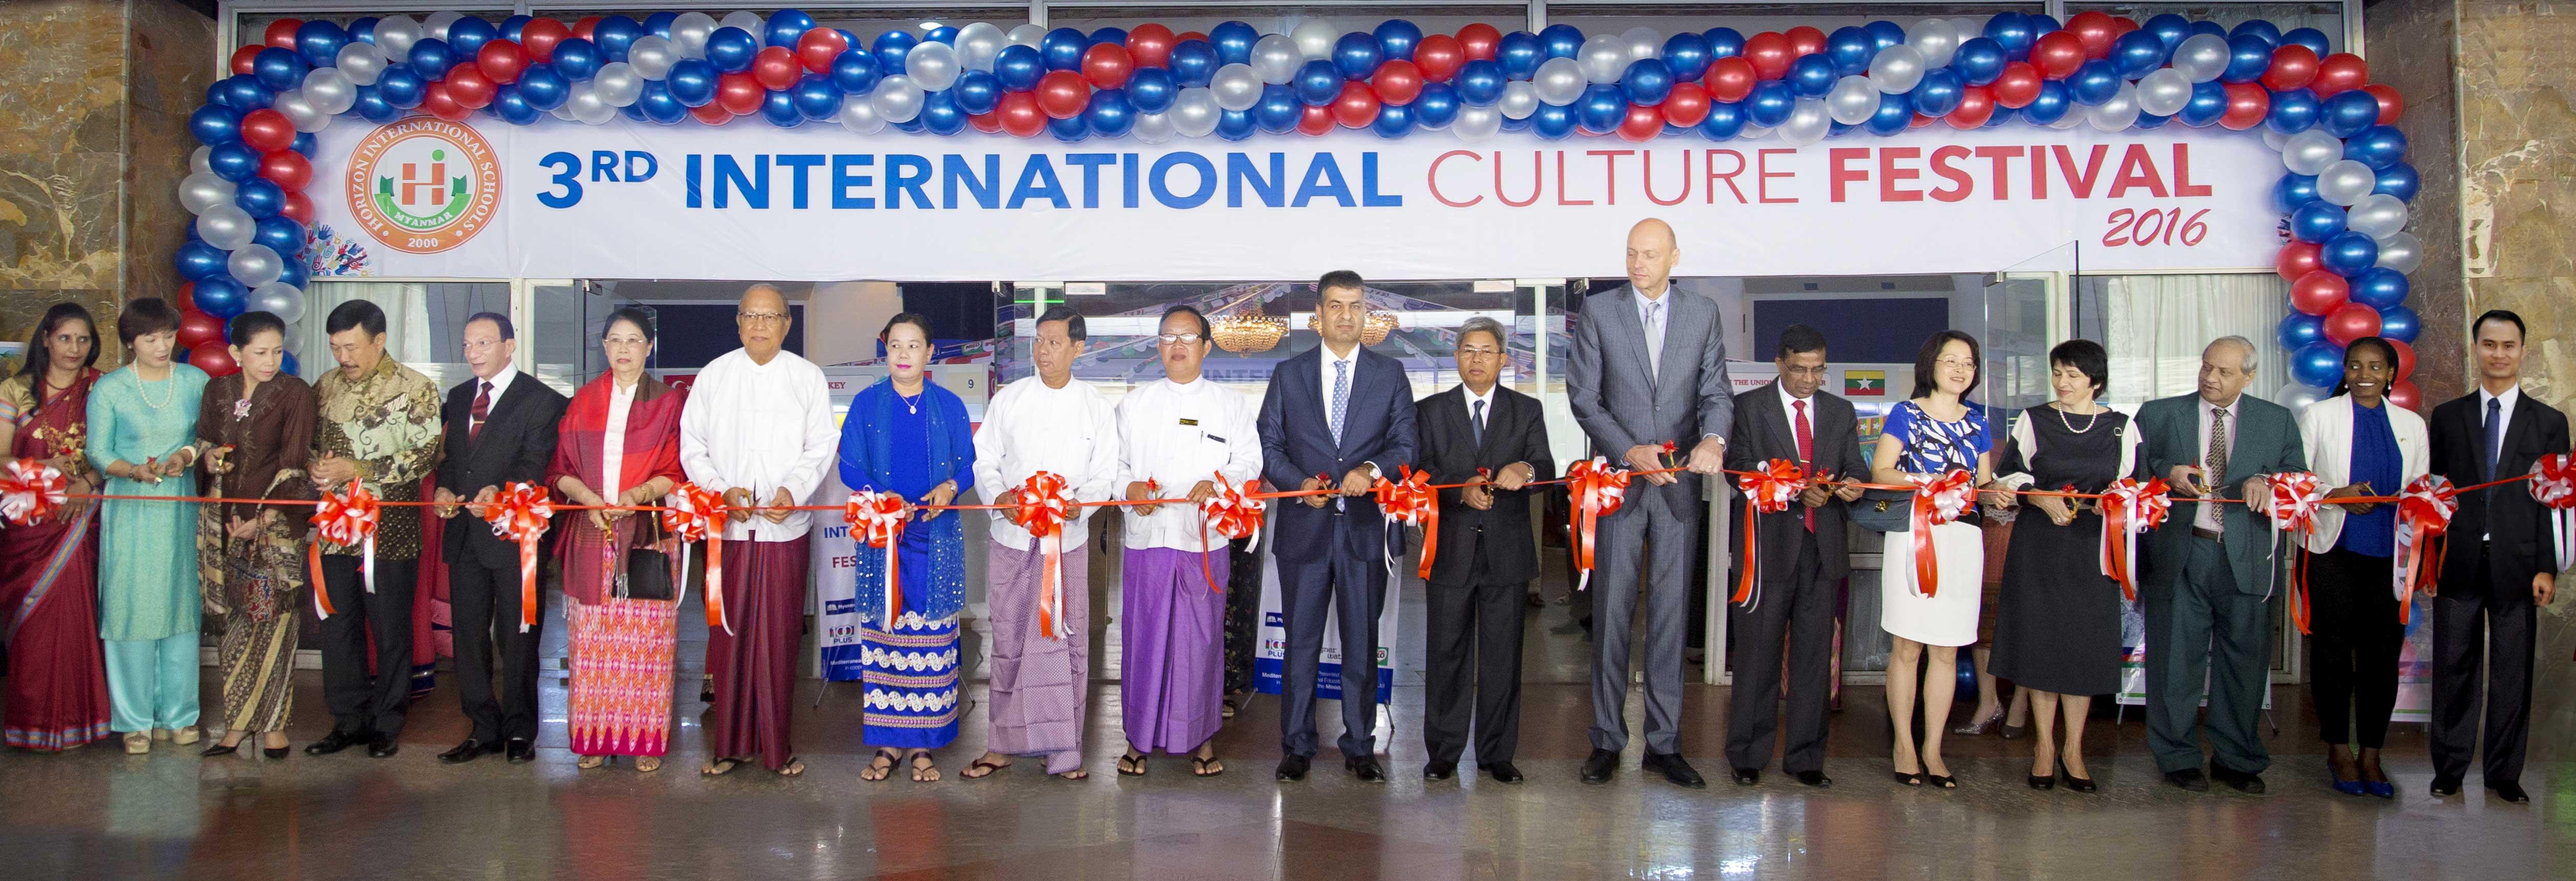 3rd International Culture Festival 2016